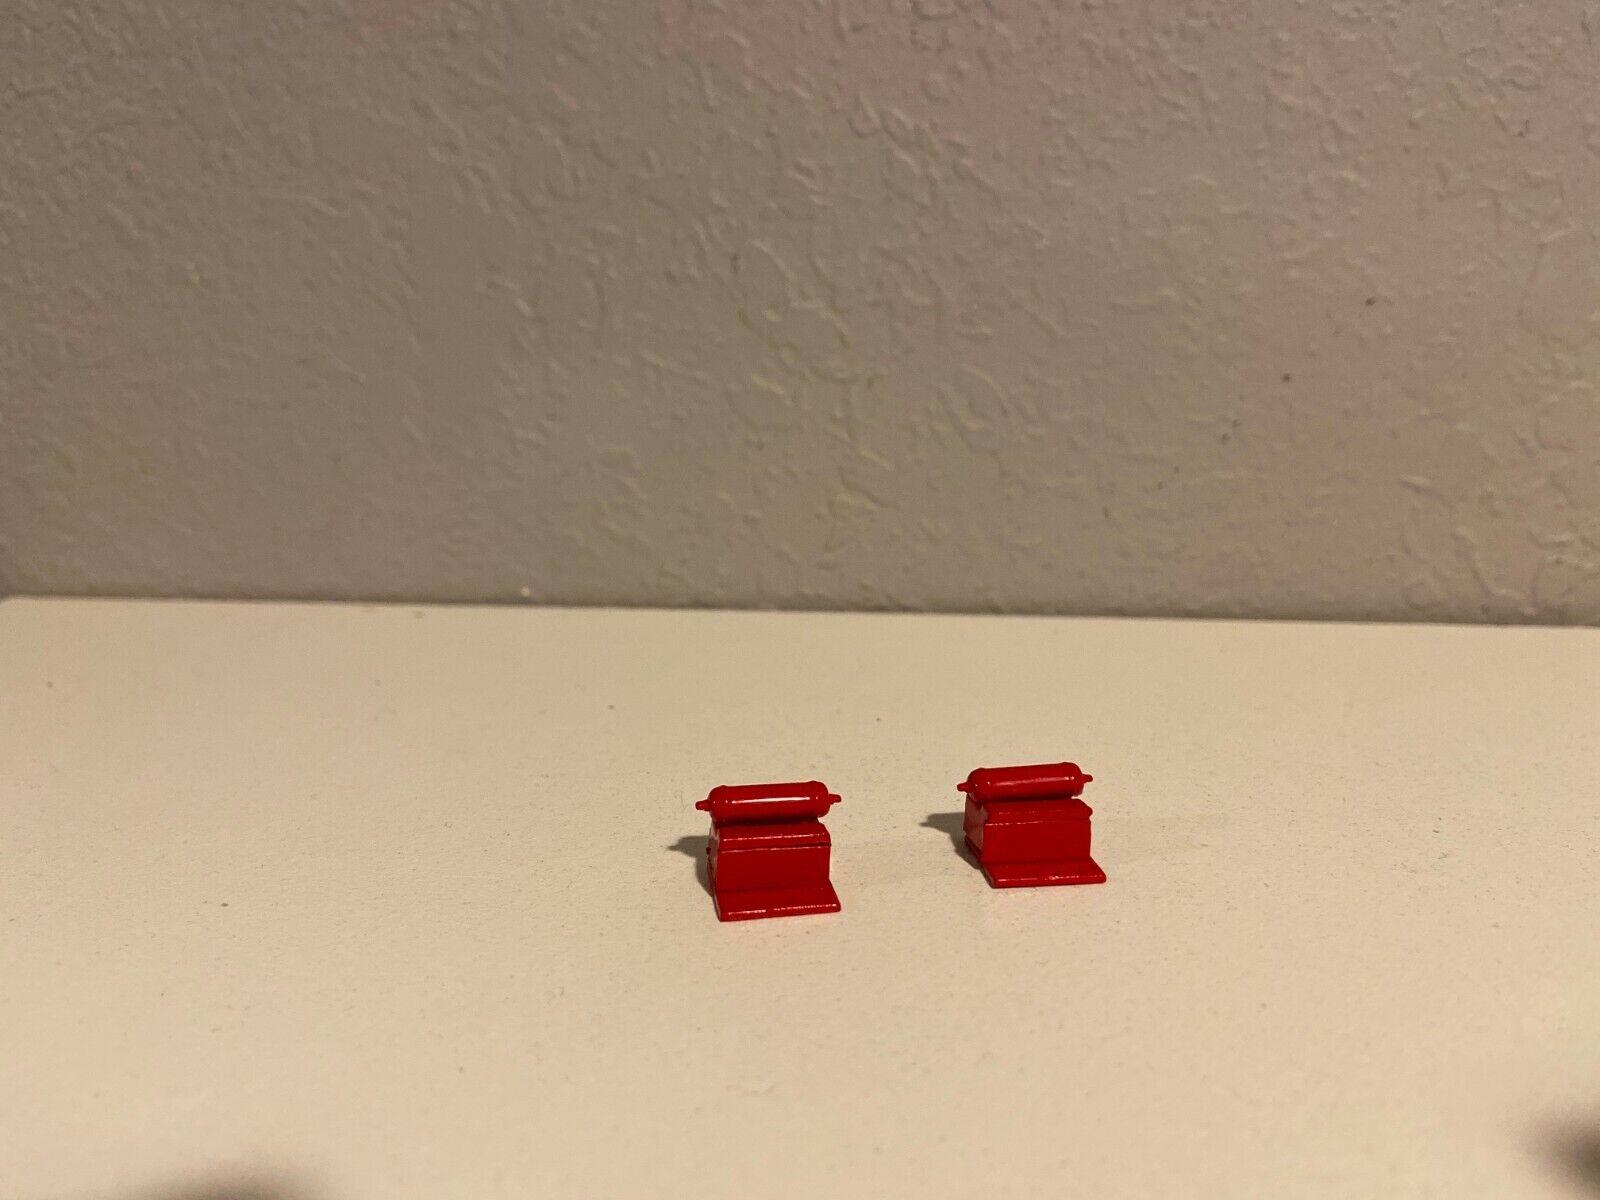 2 ALL RED DCP 1/64 379/389 PETERBILT STEPS